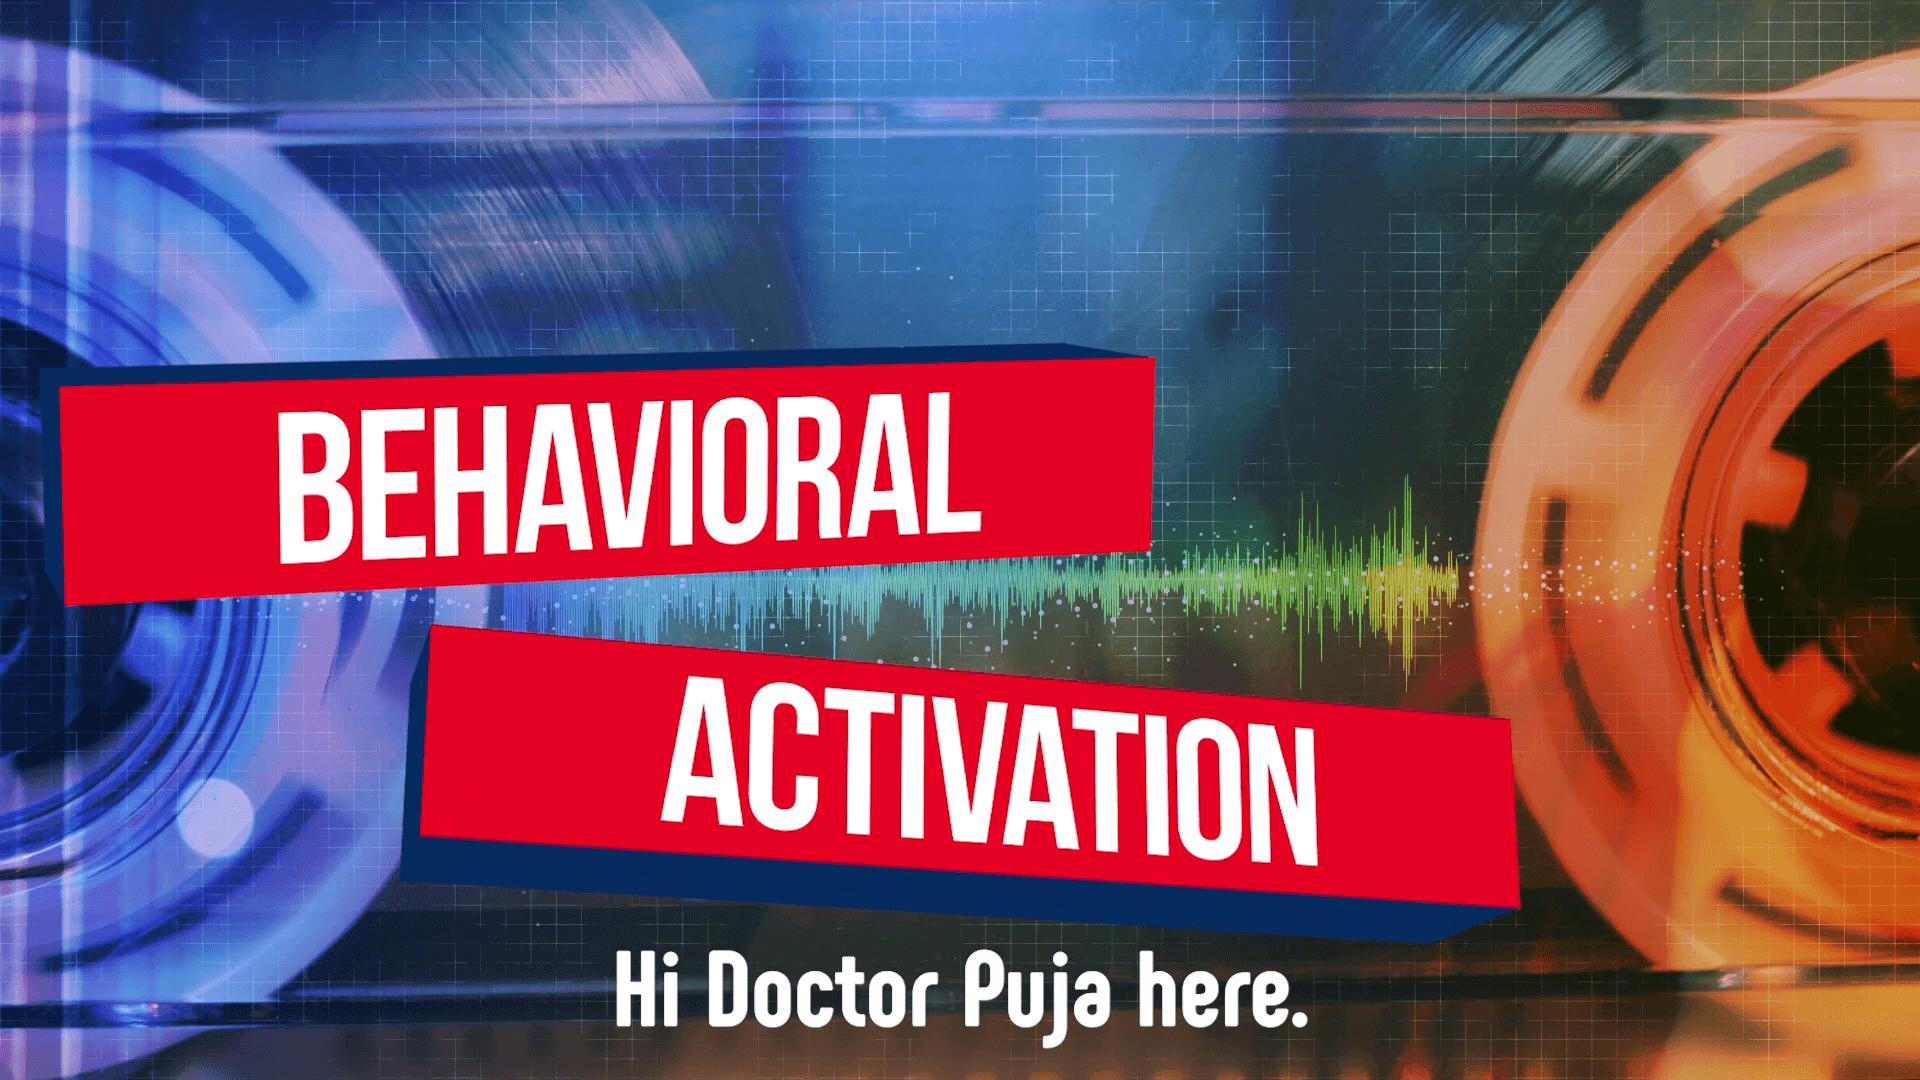 Behavioral activation explained